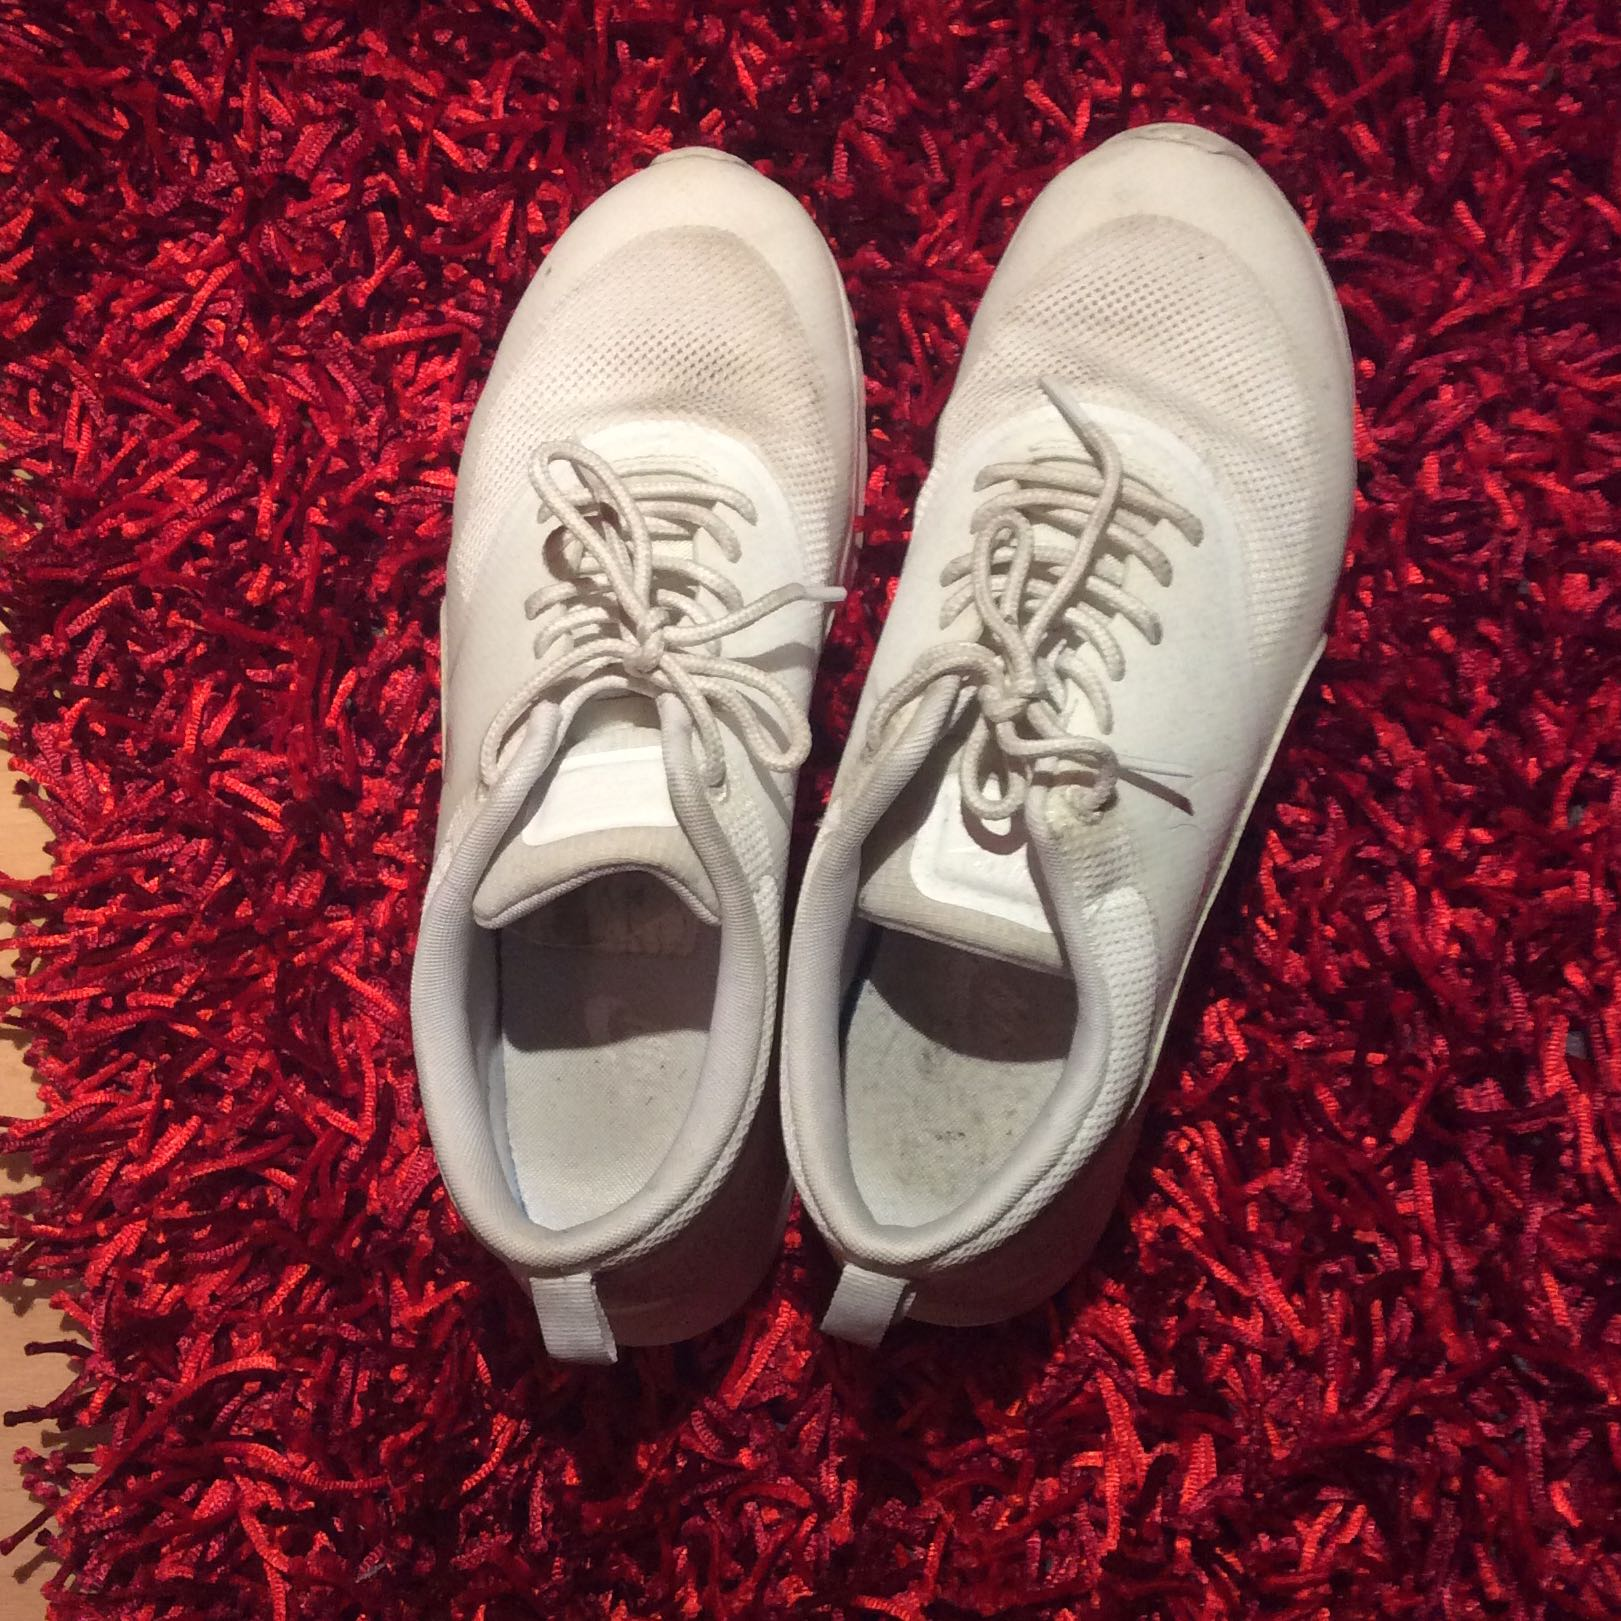 Thea Nike Hrtdsqc Max Waschen Air Schuhe Aktion LzjUpVMGqS